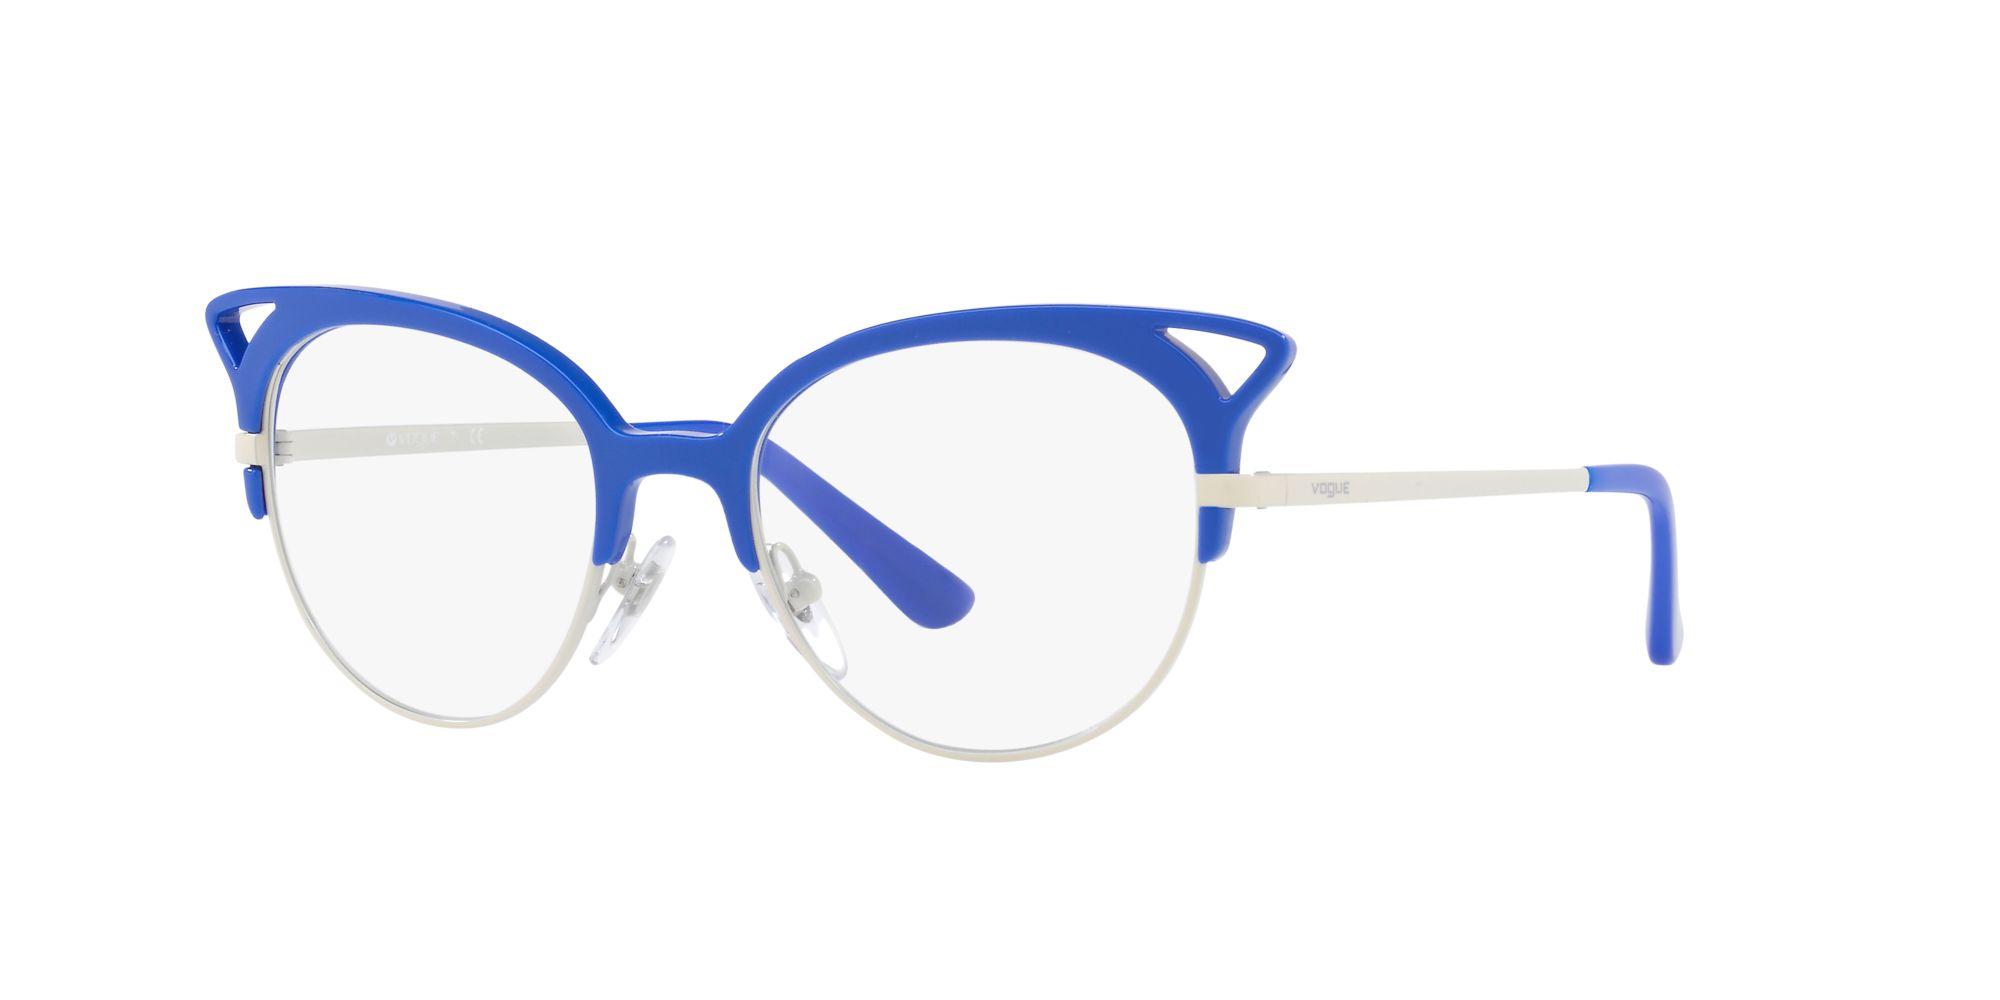 Occhiali da Vista Vogue Eyewear VO5138 V-edge 2540 r2rgh